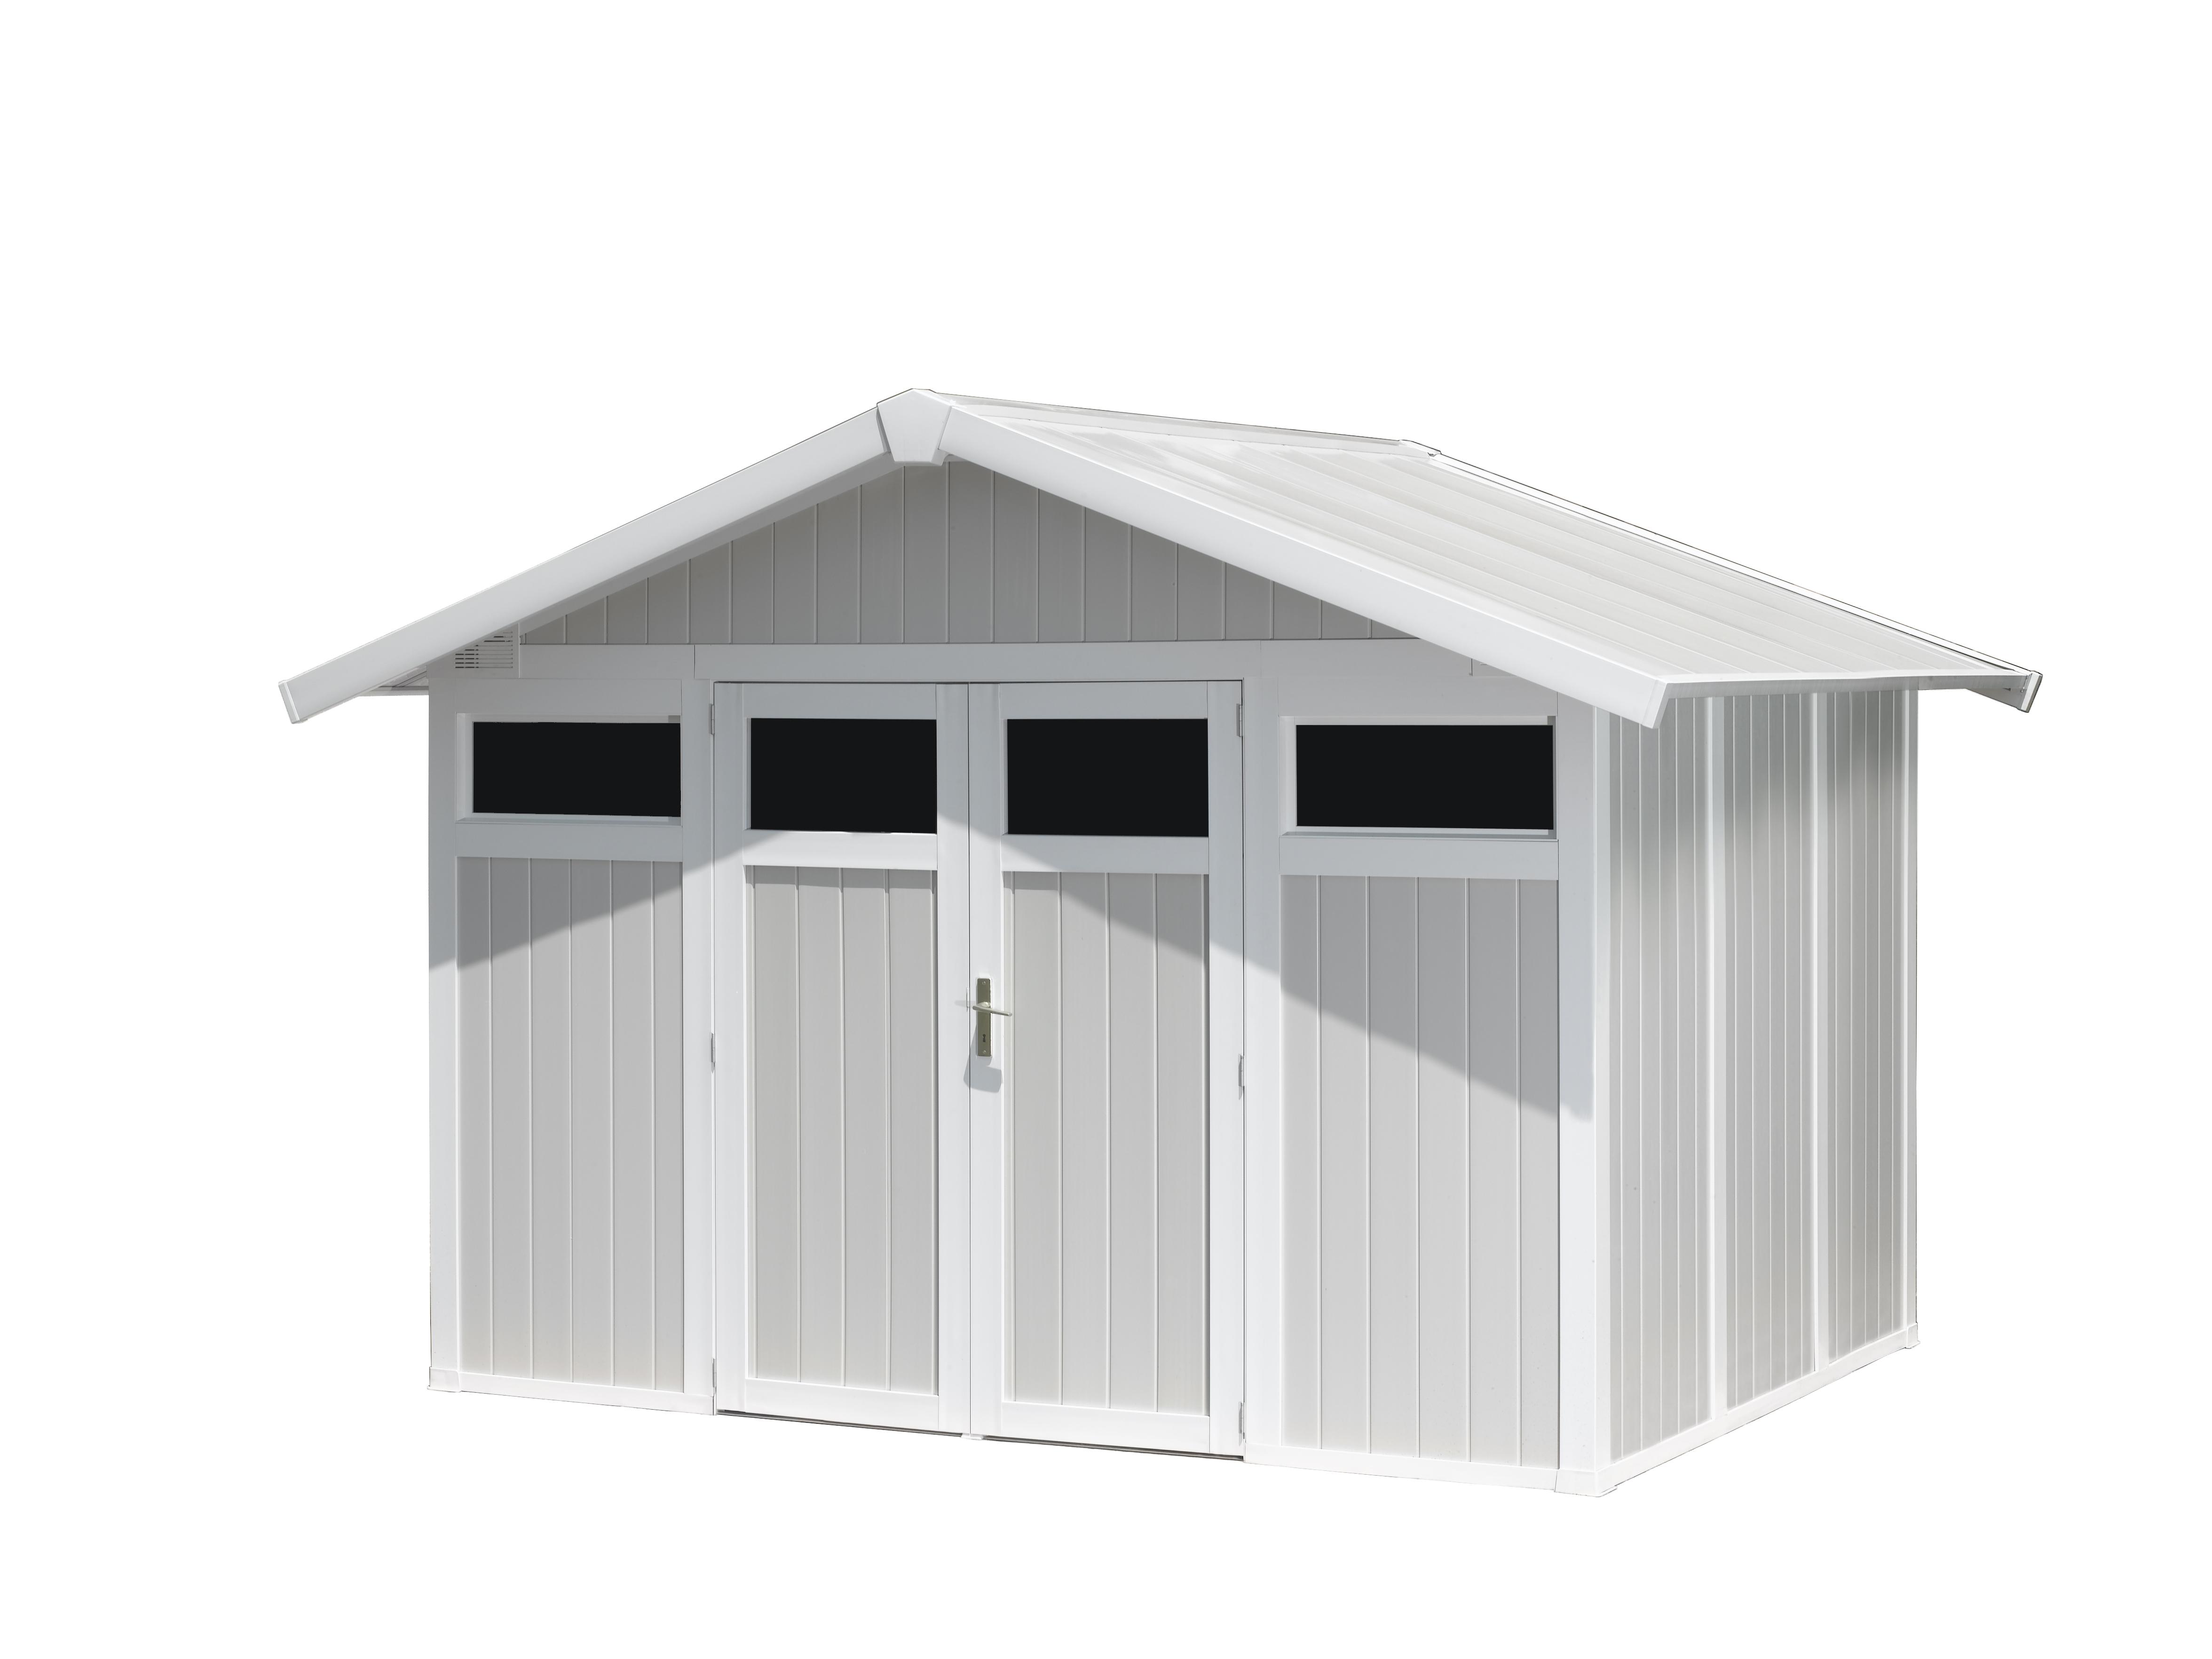 Abri De Jardin Composite utility garden shed 7,5 m² | grosfillex